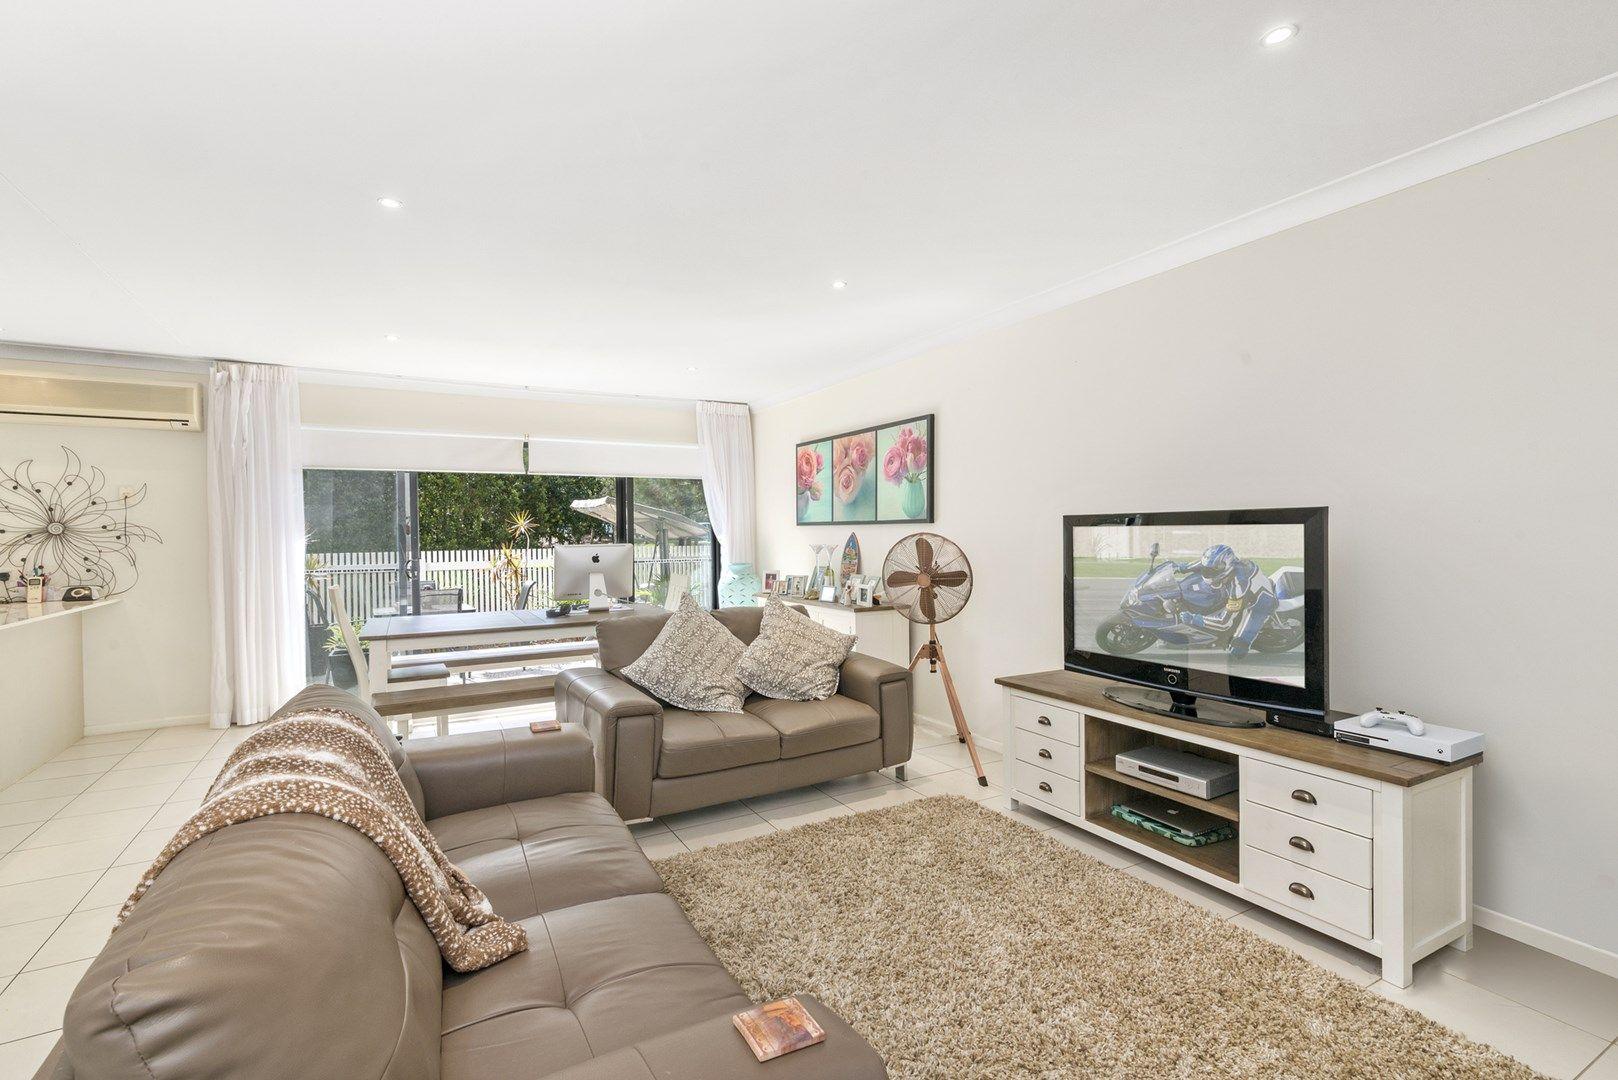 187/2 Inland Drive, Tugun QLD 4224, Image 0